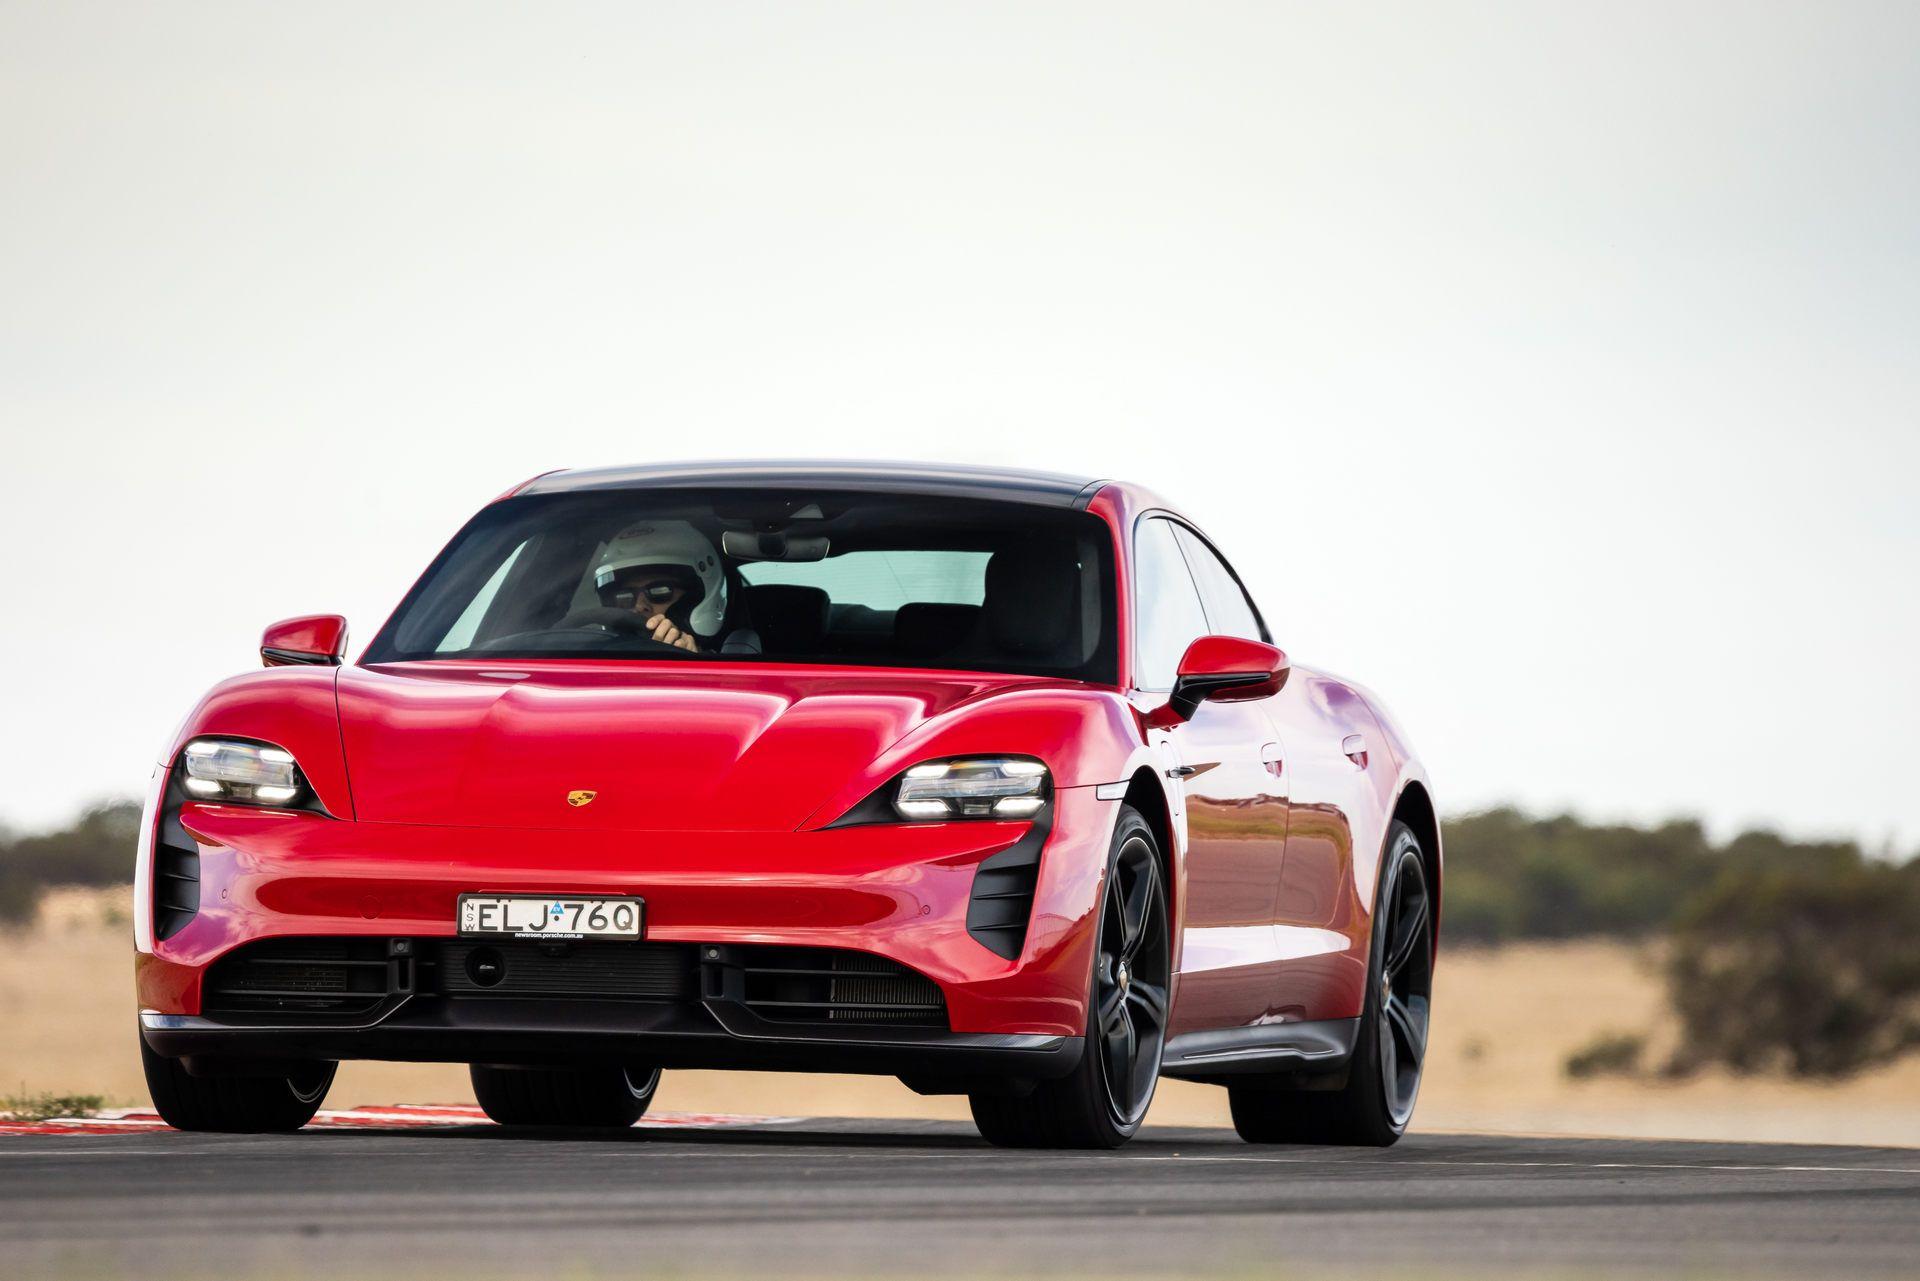 Porsche-Taycan-Turbo-S-The-Bend-Motorsport-Park-13